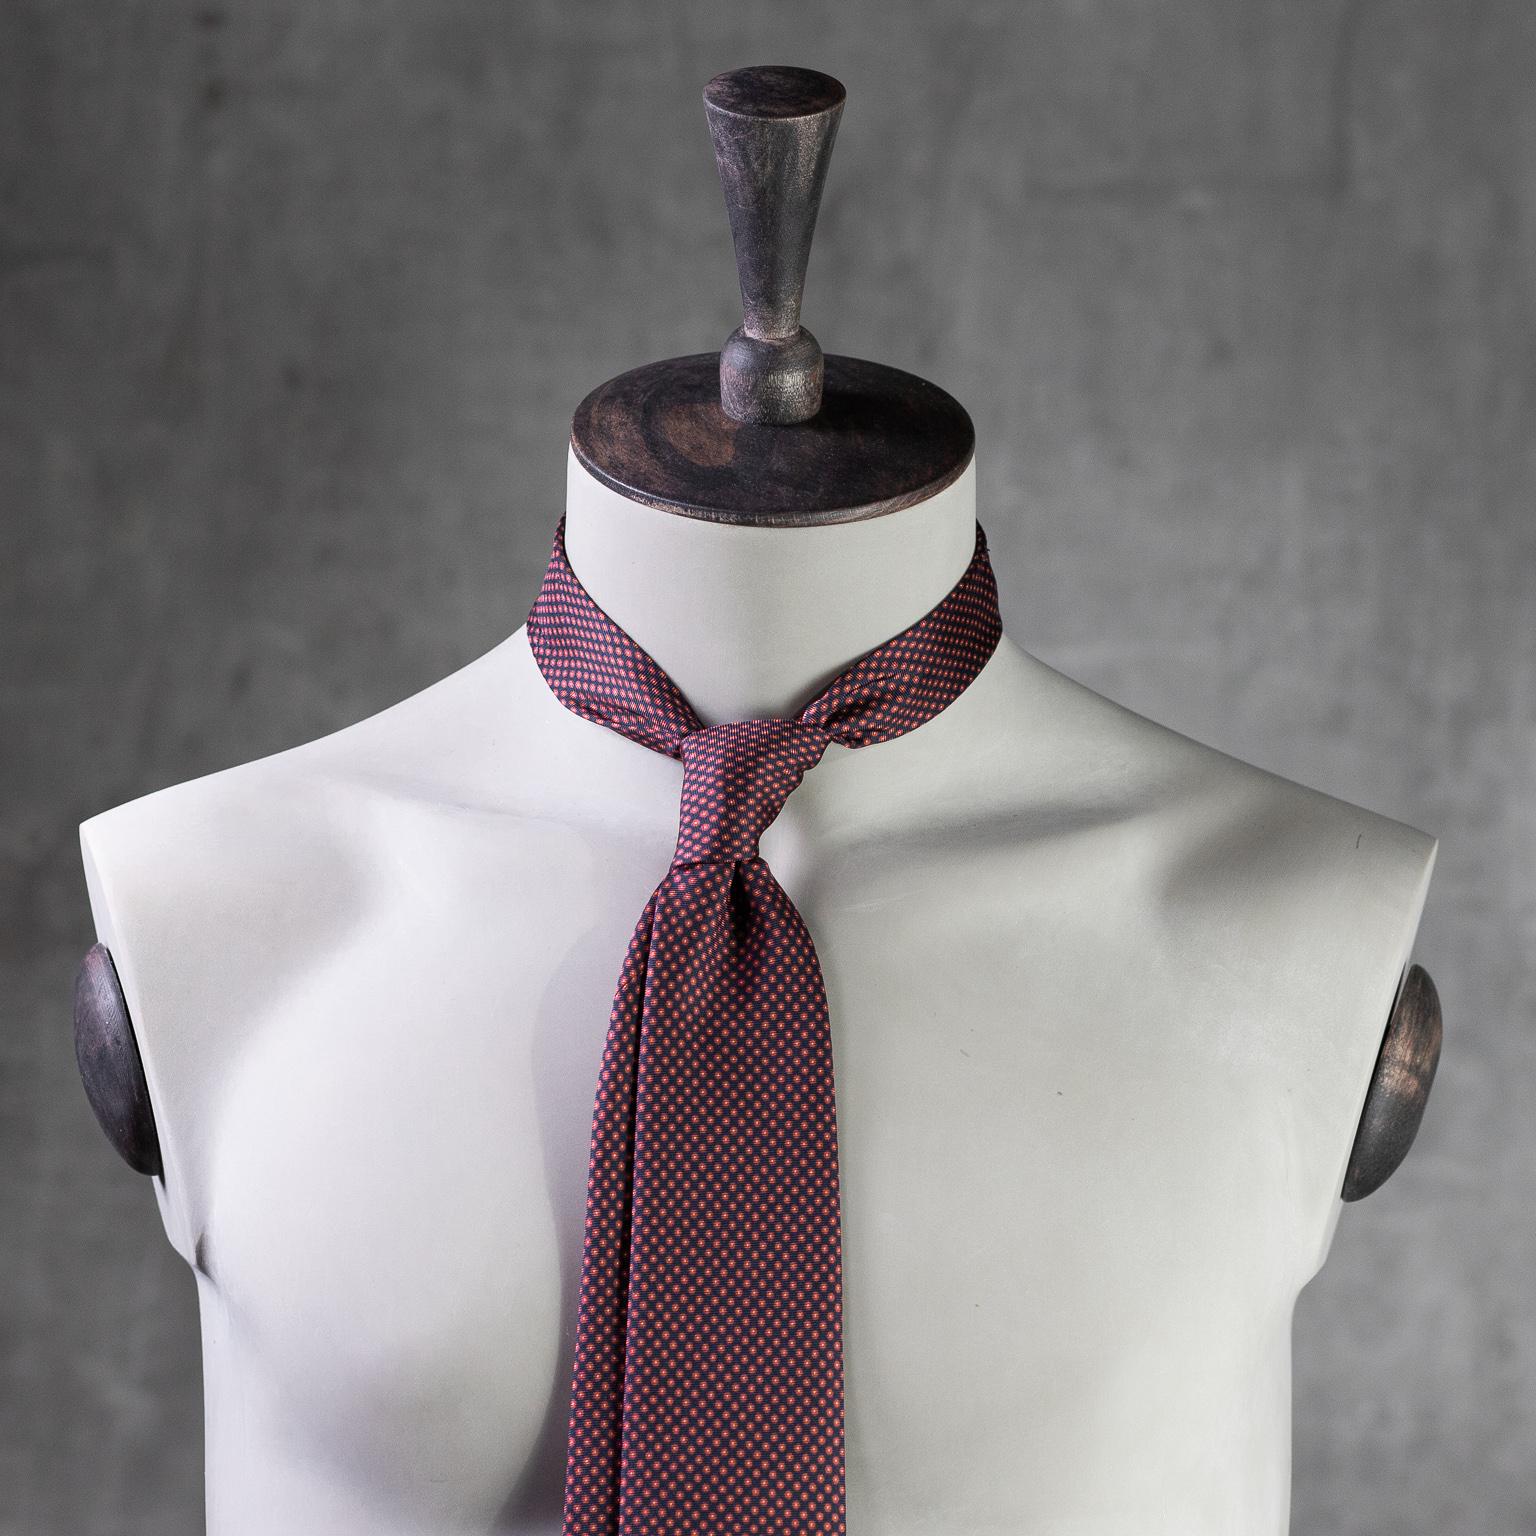 PRINTED-SILK-SEDA-ESTAMPADA-0581-Tie-Initials-Corbata-Iniciales-The-Seëlk-2